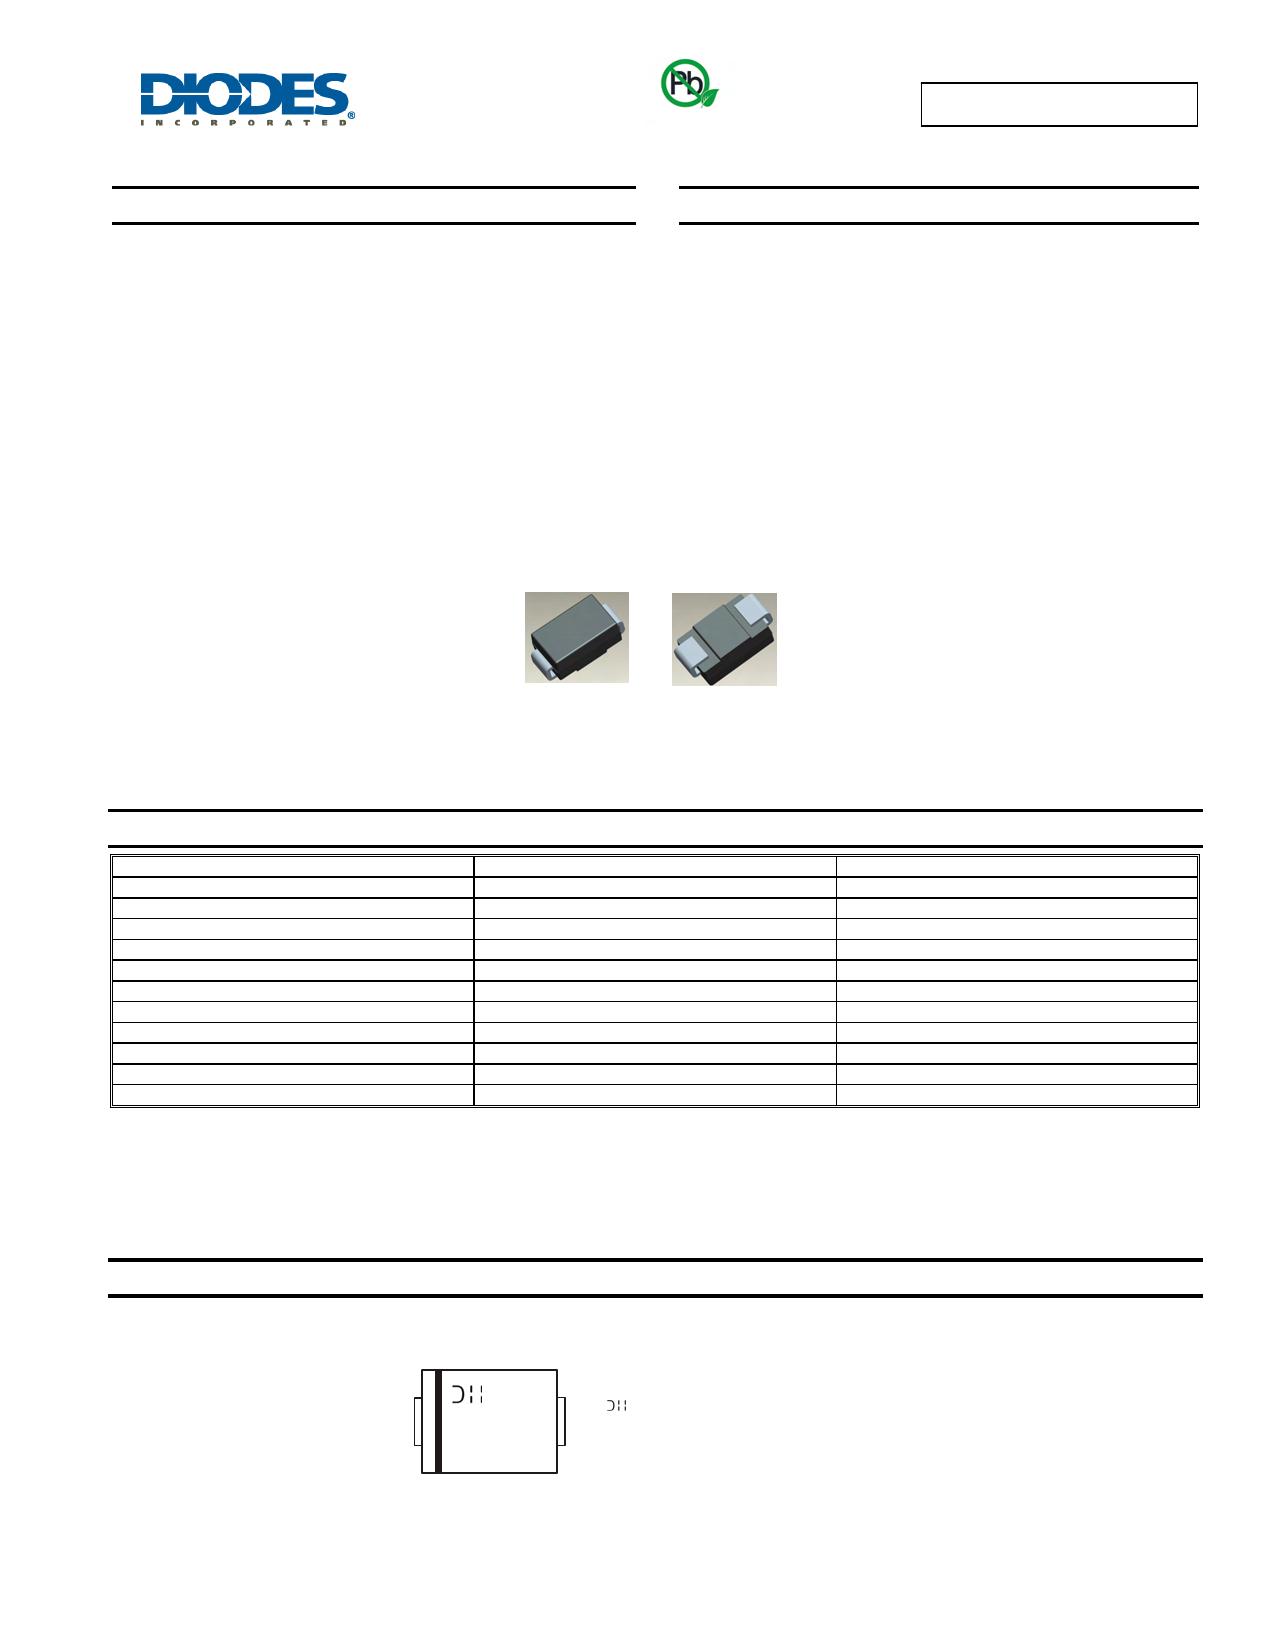 TB1300M datasheet